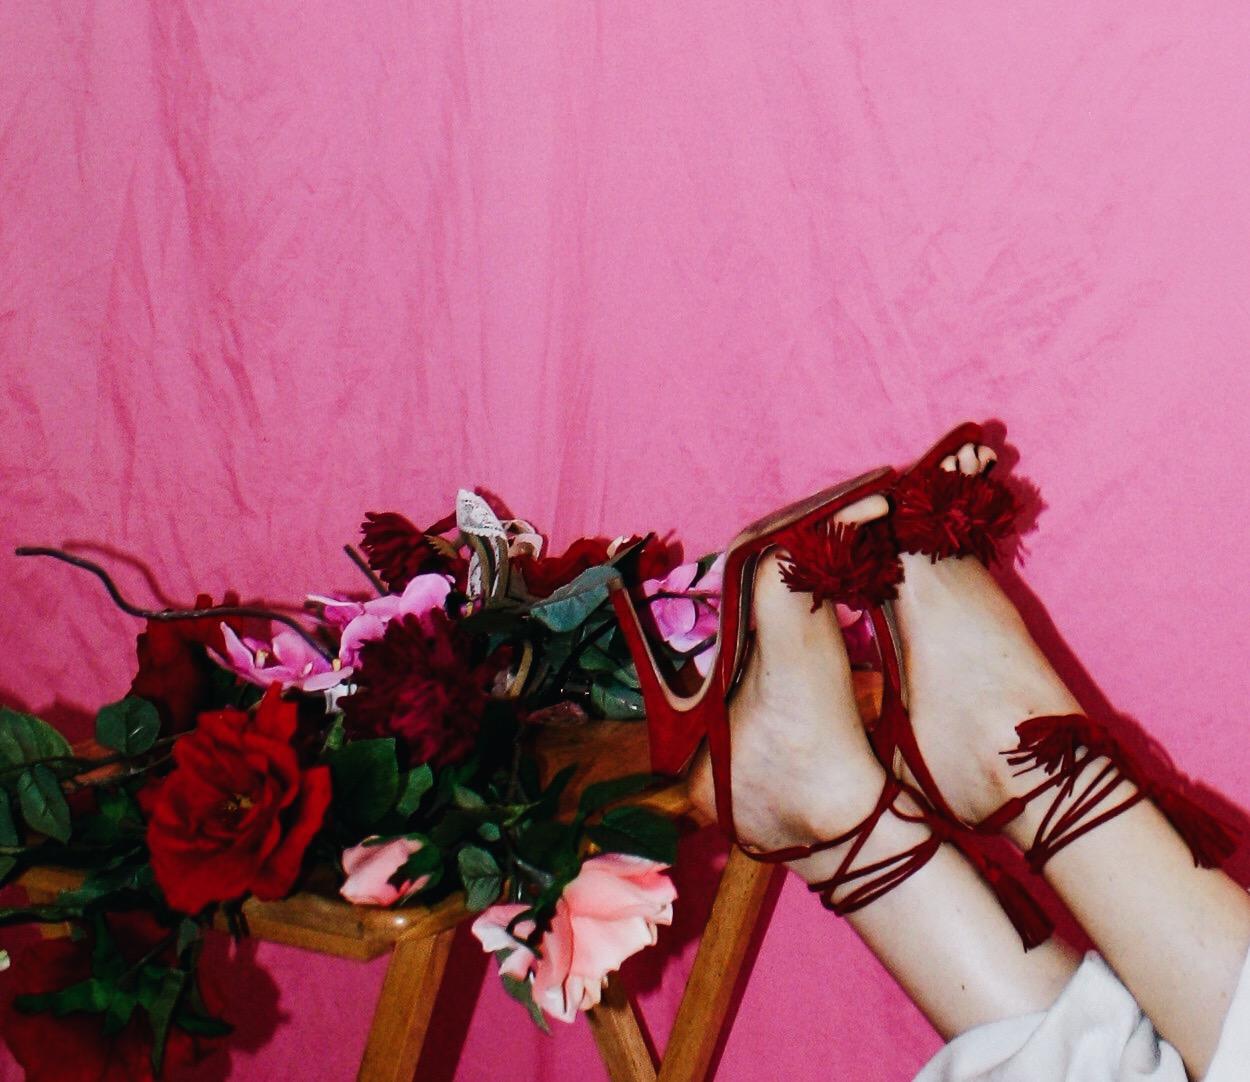 proenza schouler designer imitation white ruffle top spring summer 2018 2017 flowers pink aquazzura red wild things sandal fringe